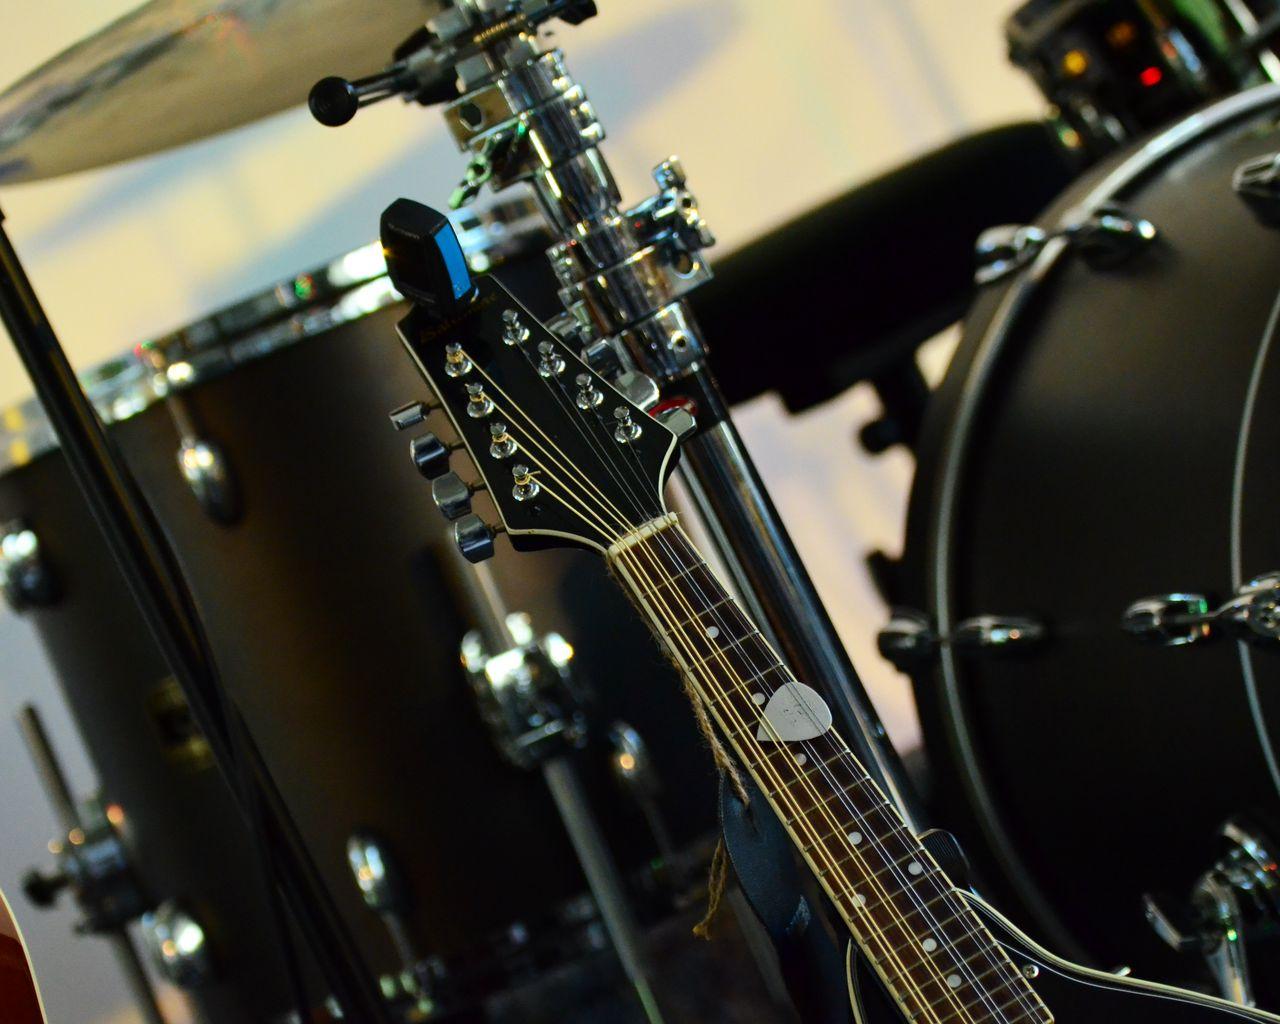 1280x1024 Wallpaper musical instrument, music, percussion, guitar